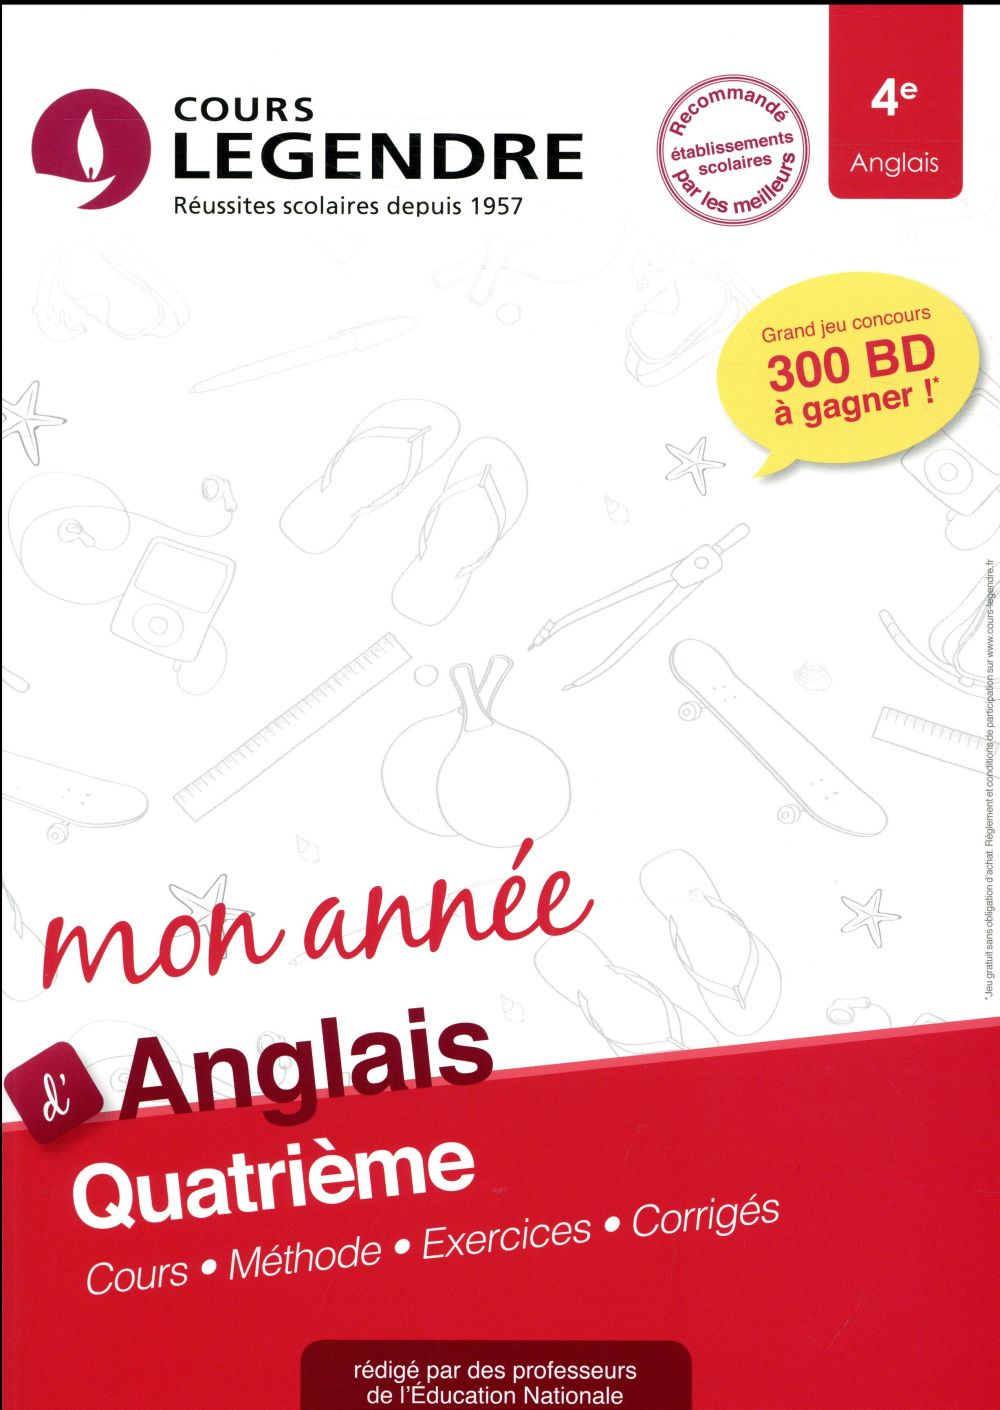 Cours Legendre ; anglais ; 4e année